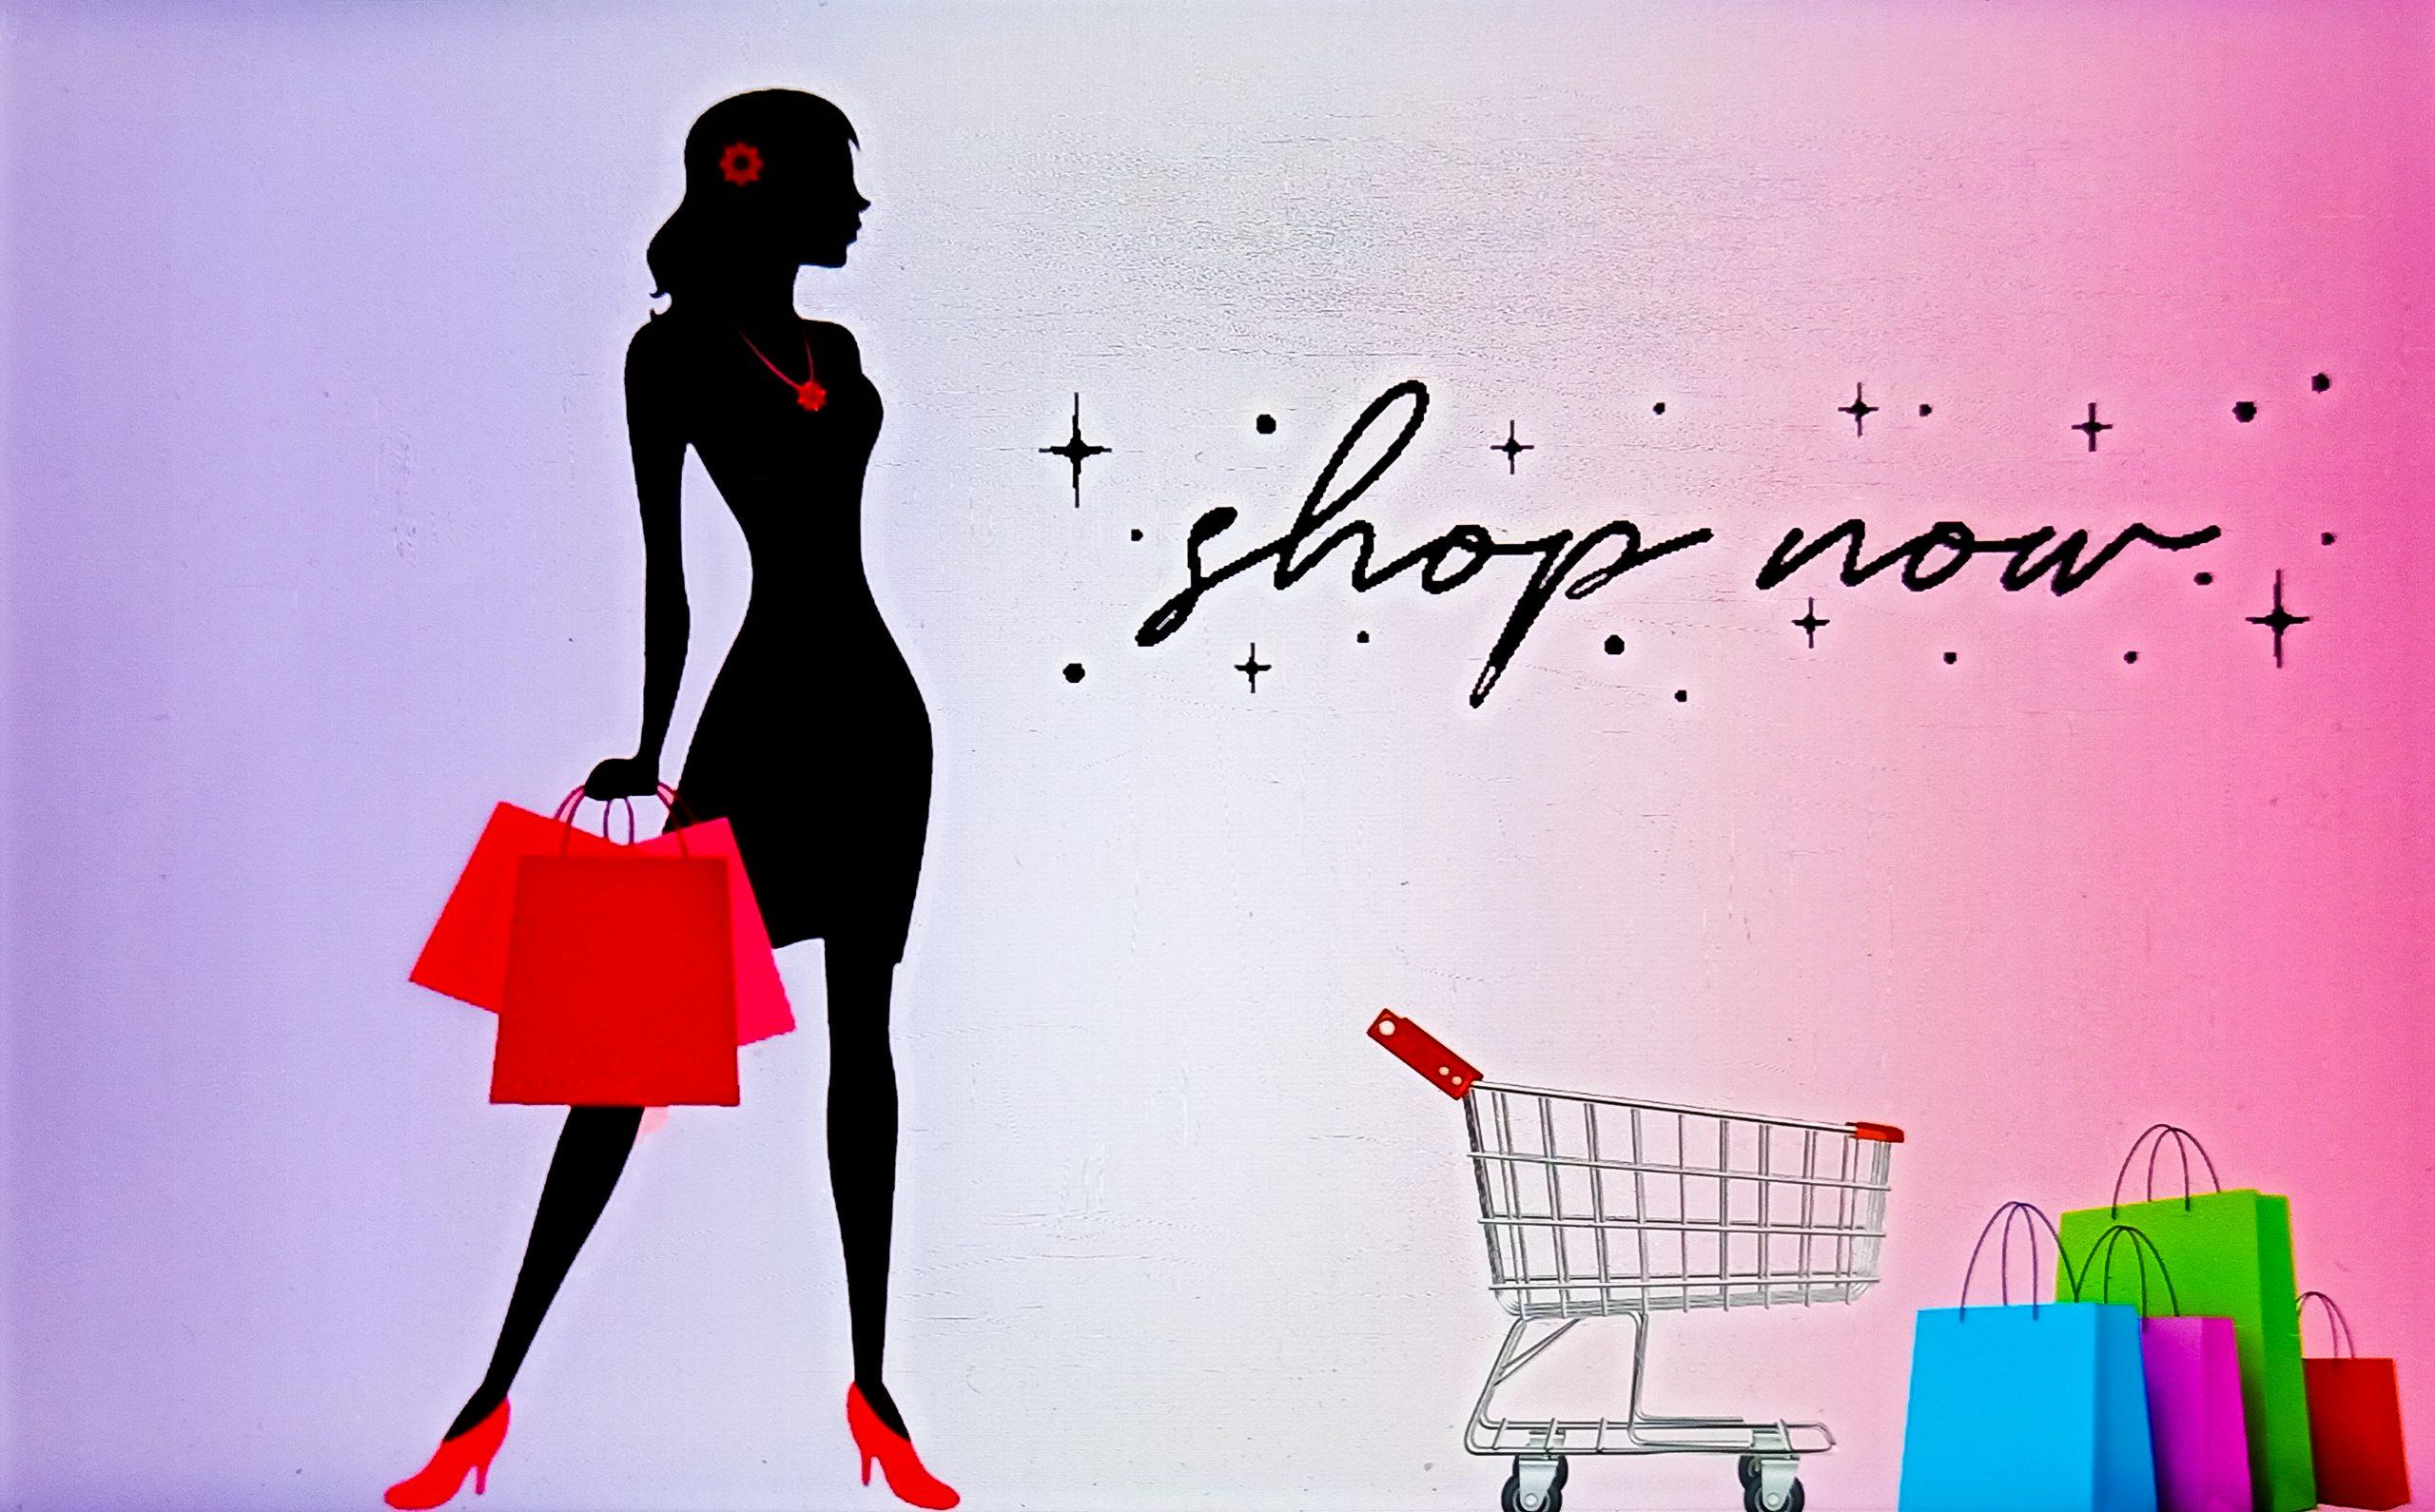 A shopping illustration